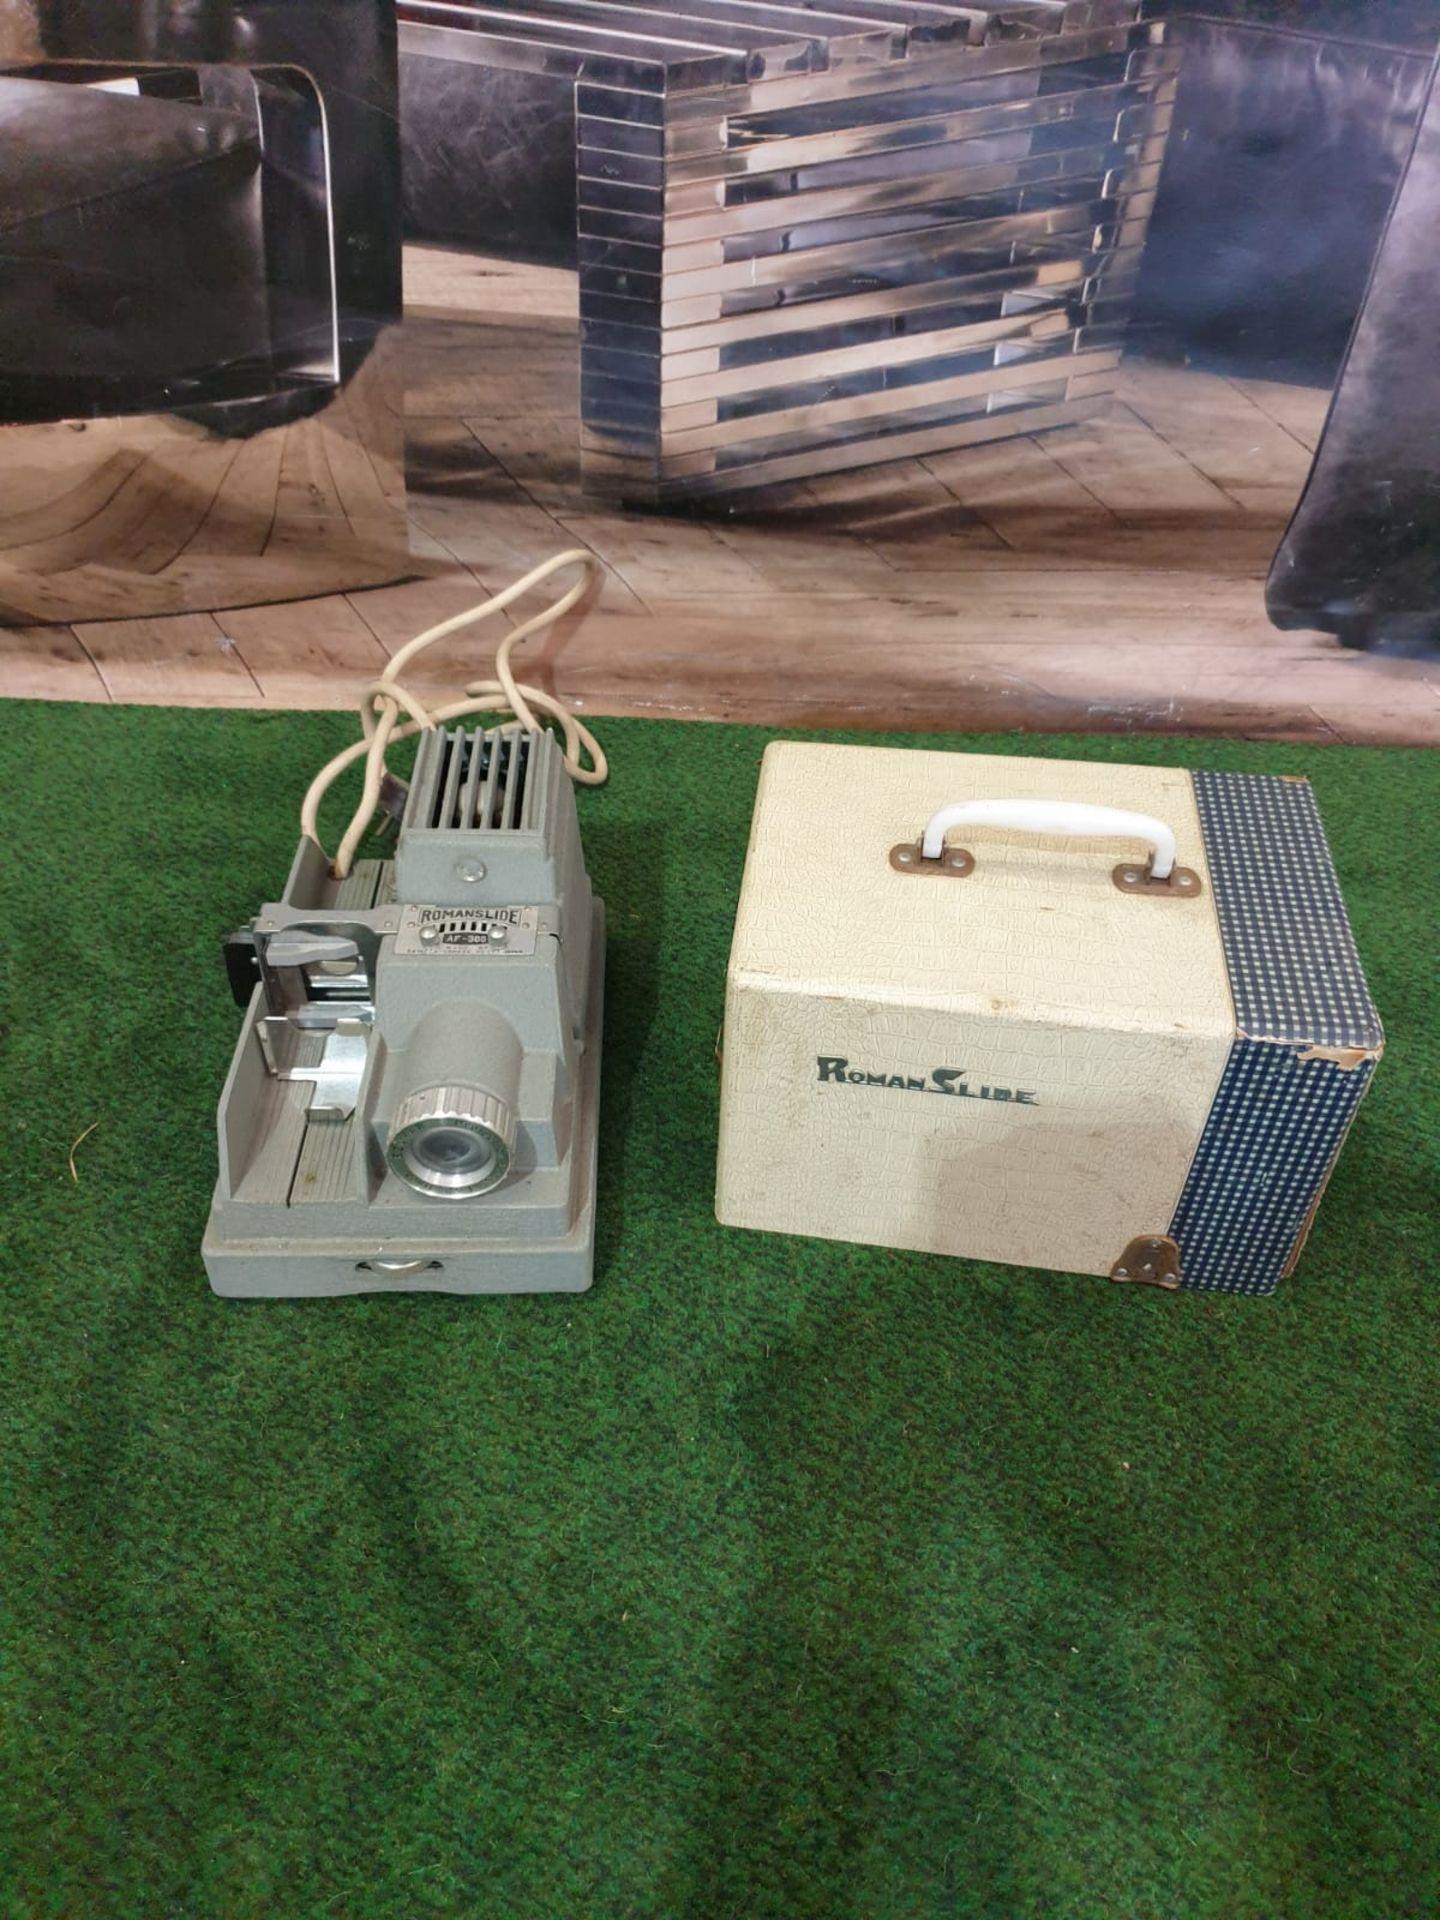 Samoca Camera AF-300 Projector Roman Slides Projector Screen 26 x 18 x 16cm Dates to 1955- 1956 - Image 2 of 4